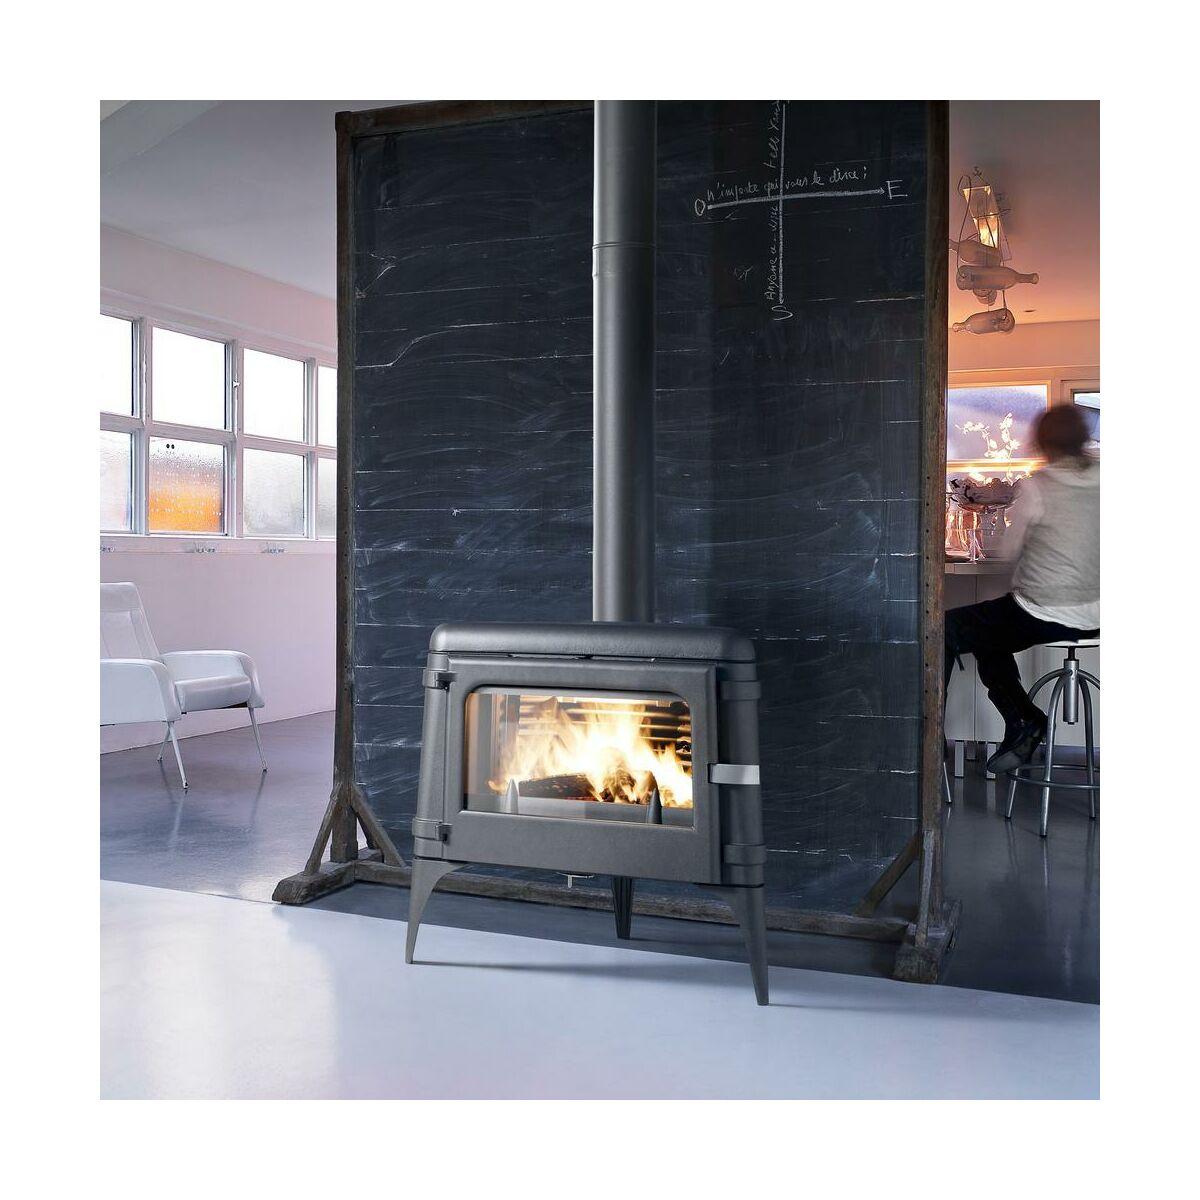 piec kominkowy luna invicta sprawd opinie w leroy merlin. Black Bedroom Furniture Sets. Home Design Ideas